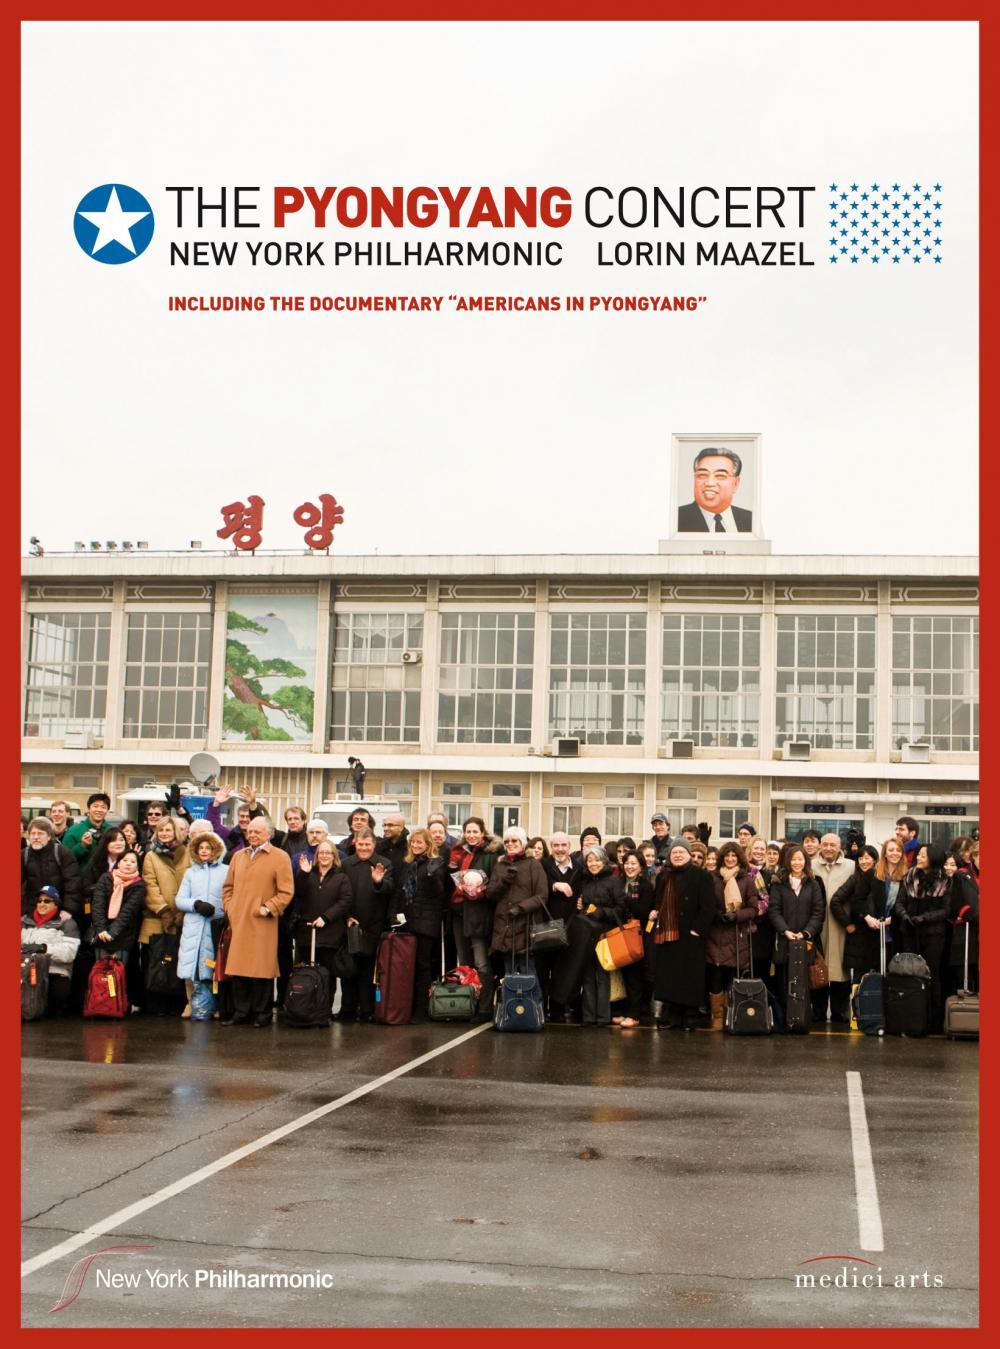 08-09-pyongyangcover300dpi.jpg